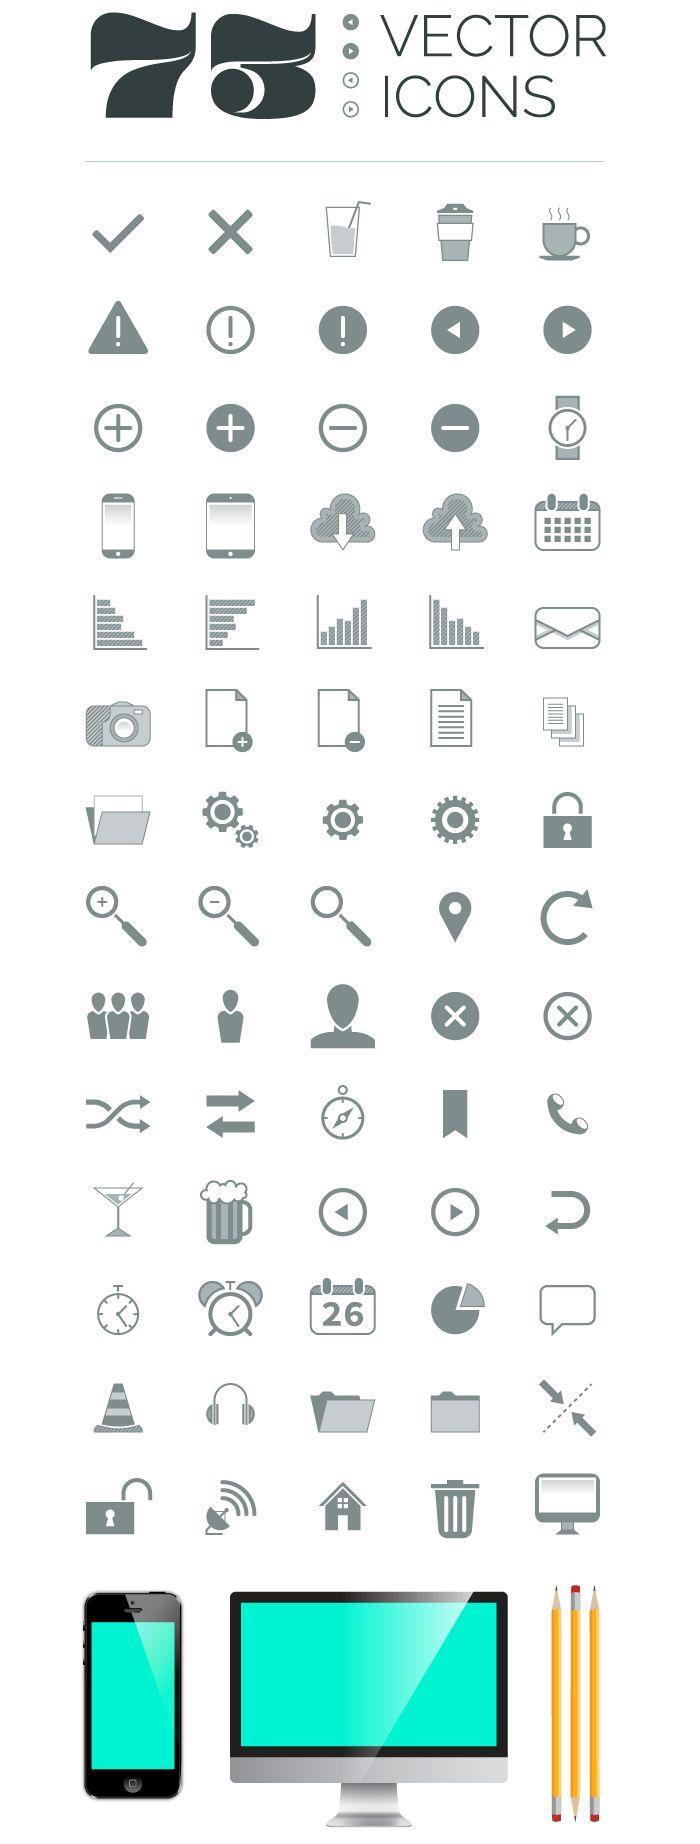 73 #Vector #Icons, #AI, #Flat, #Free, #Graphic #Design, #Icon, #Illustration, #Resource